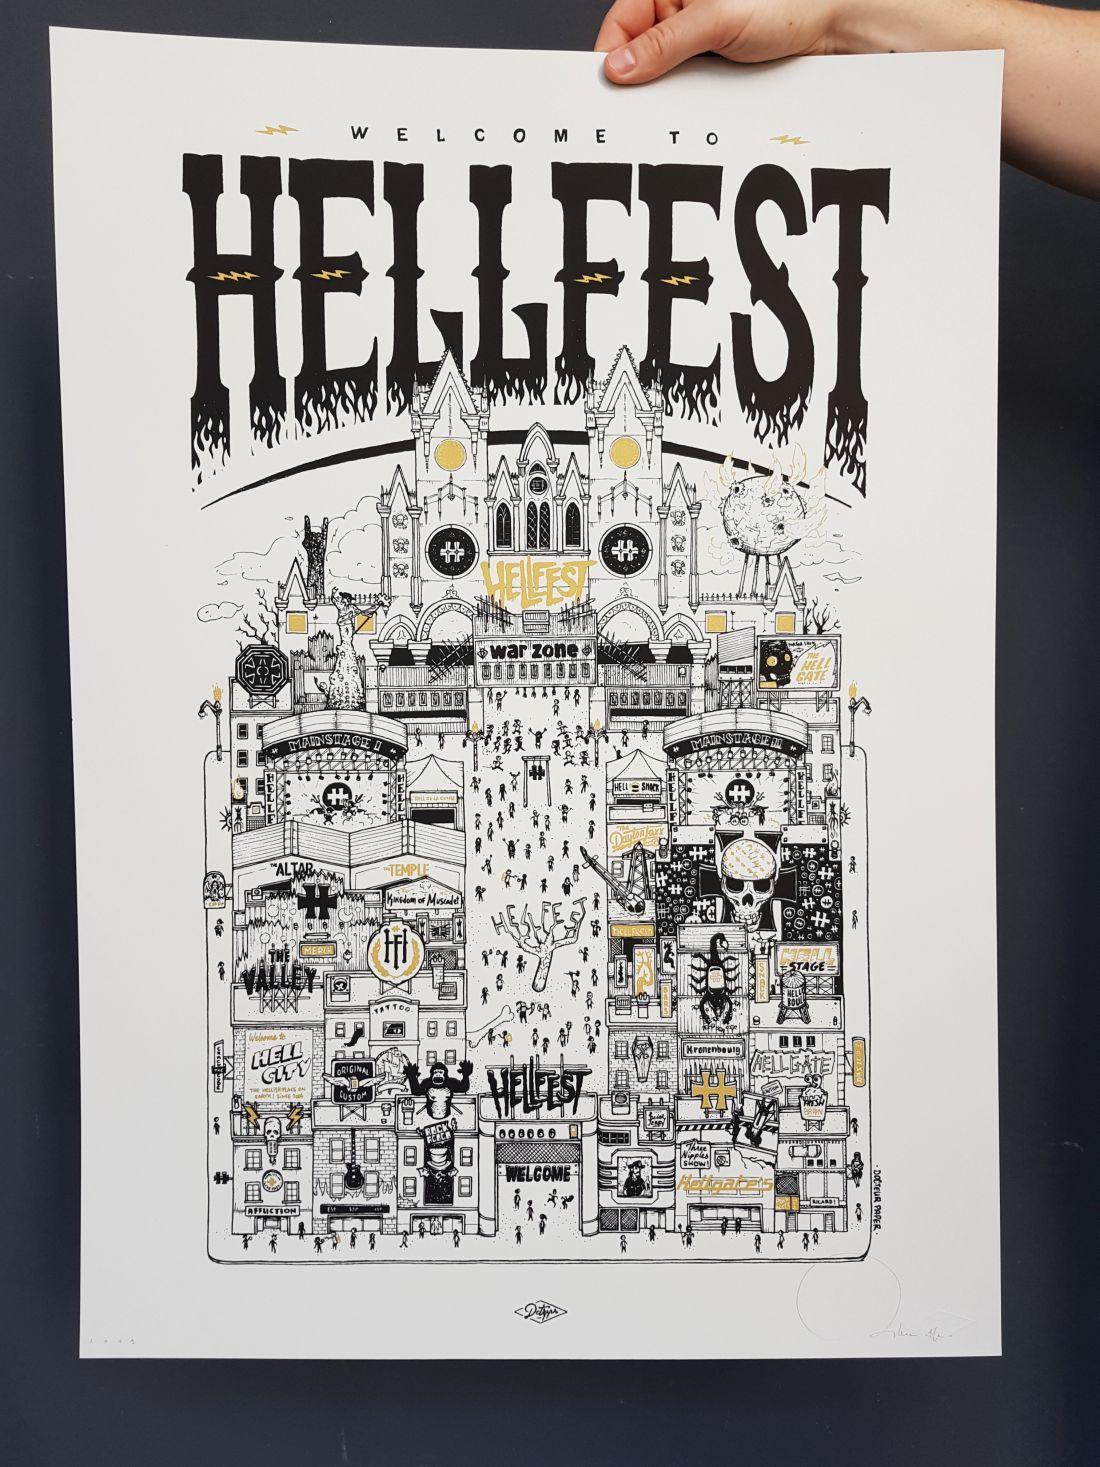 Hellfest Illustration Nantes Atelier du Grand Chic